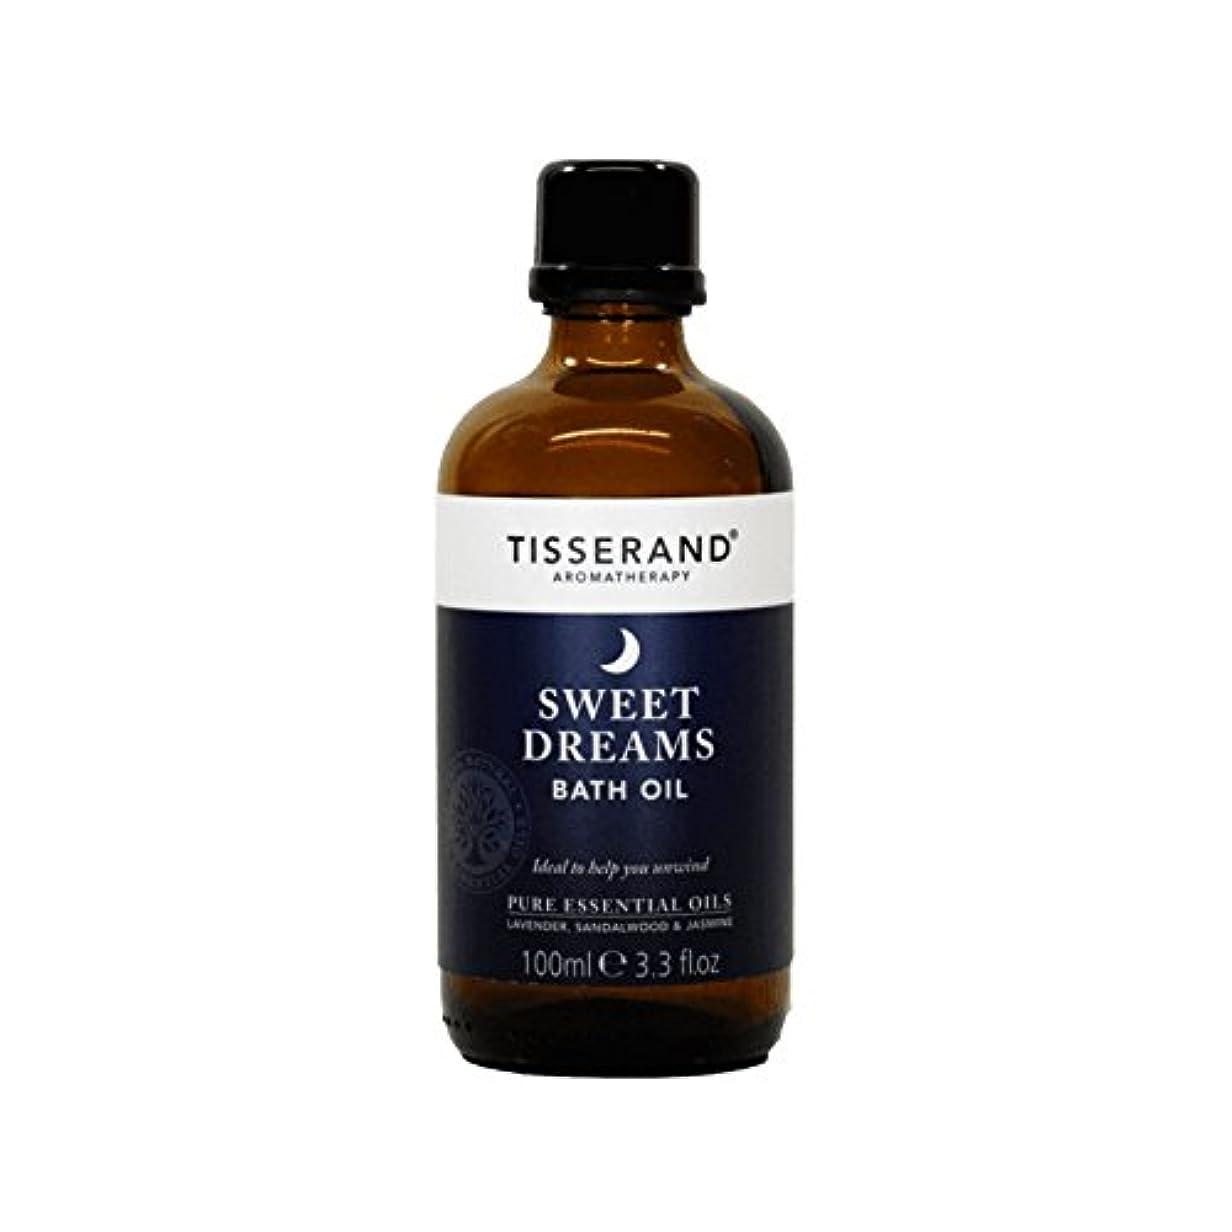 Tisserand Sweet Dreams Bath Oil 100ml (Pack of 2) - ティスランド甘い夢バスオイルの100ミリリットル (x2) [並行輸入品]